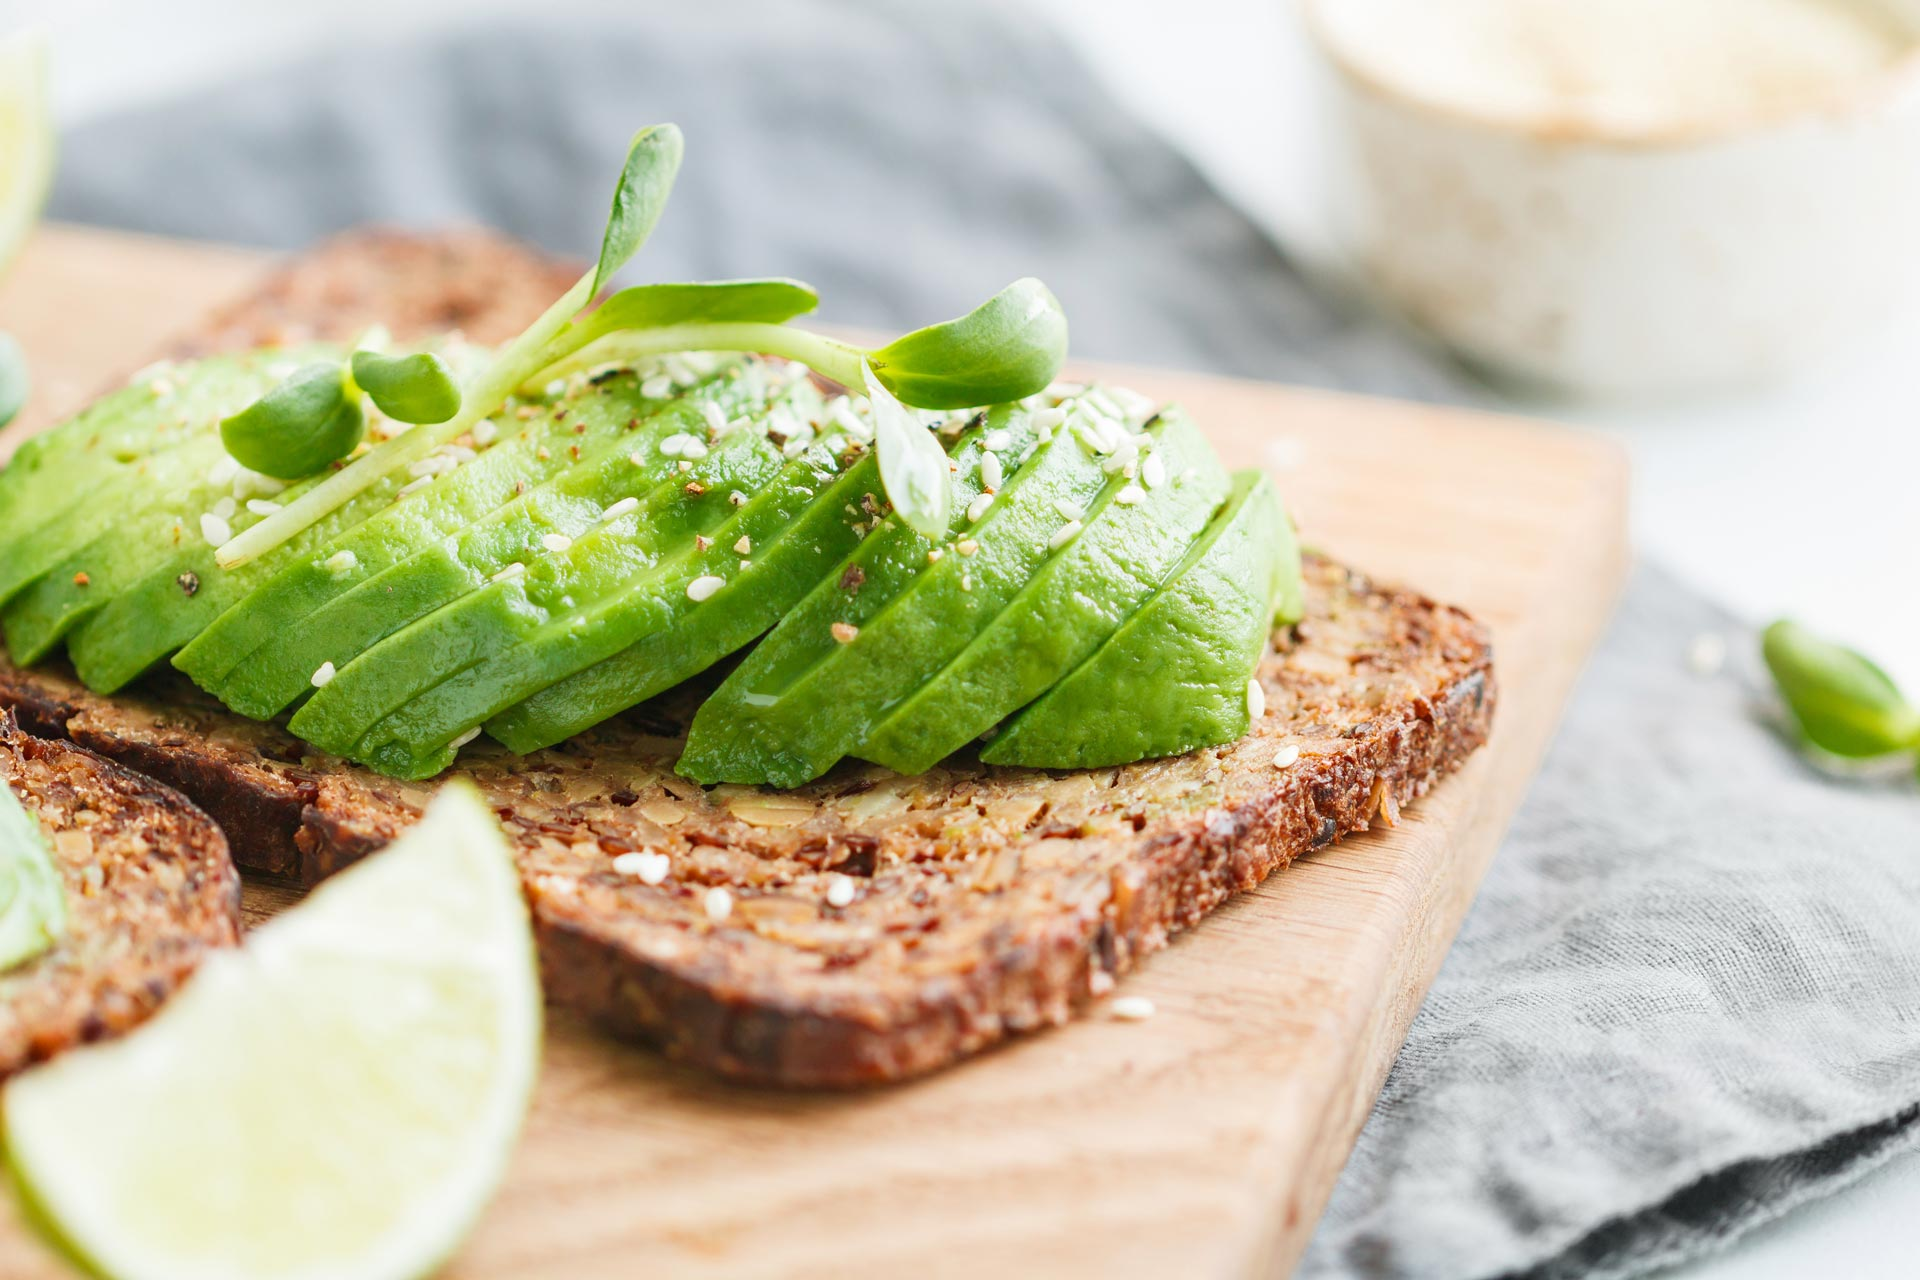 toast-with-avocado-SU9PHMQ.jpg